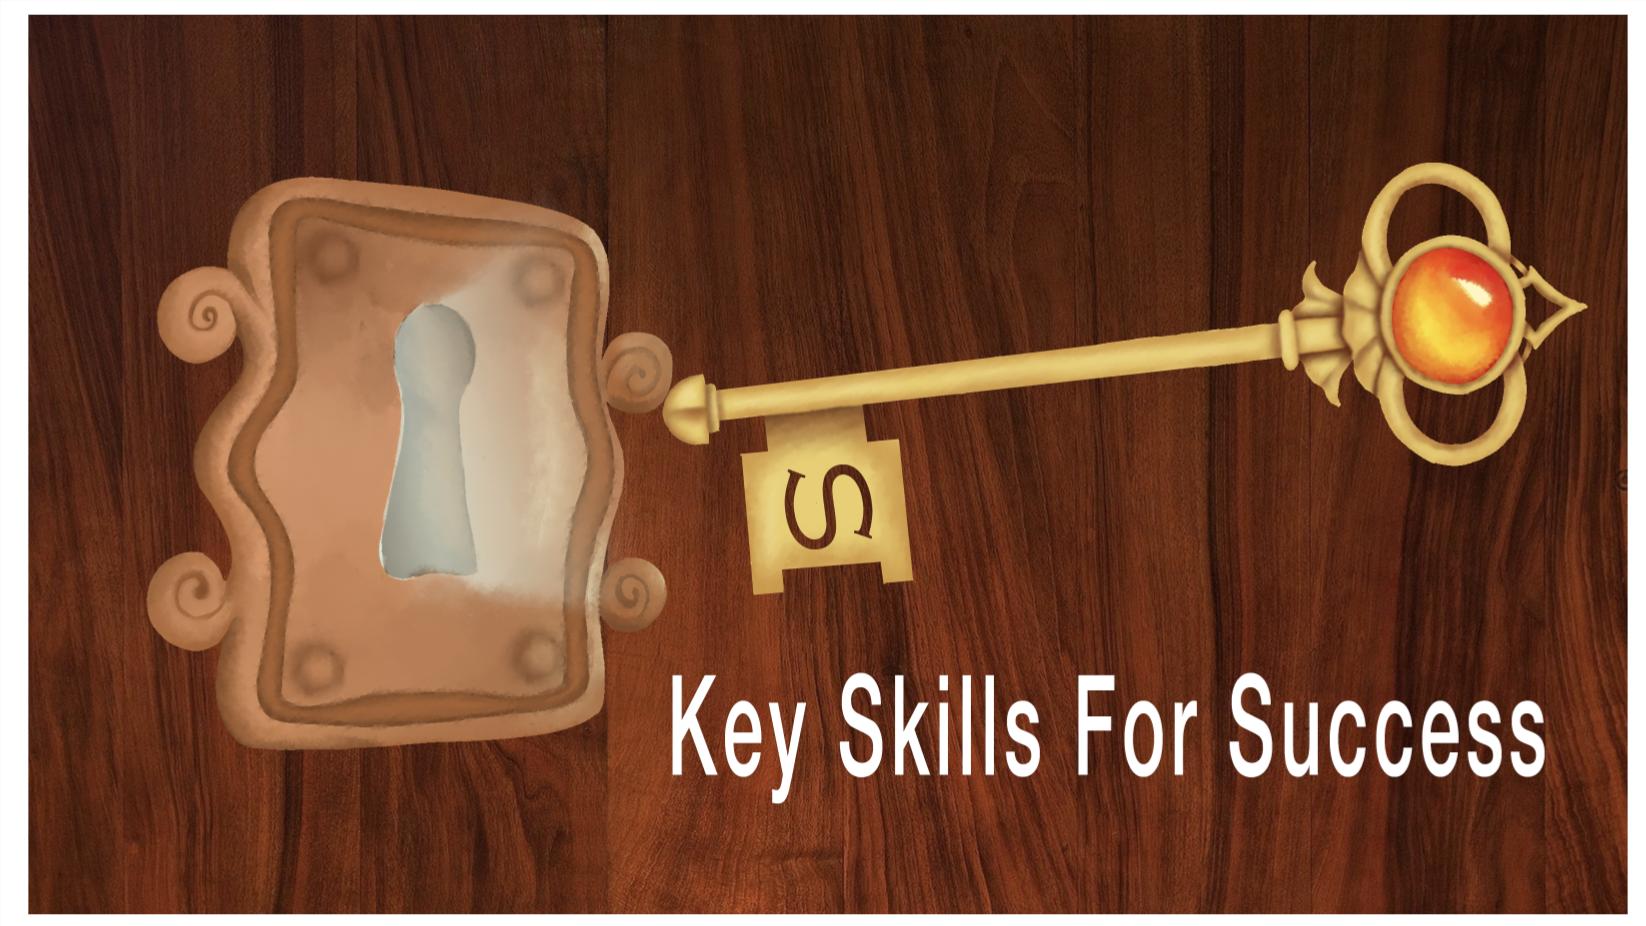 Key Skills for Success